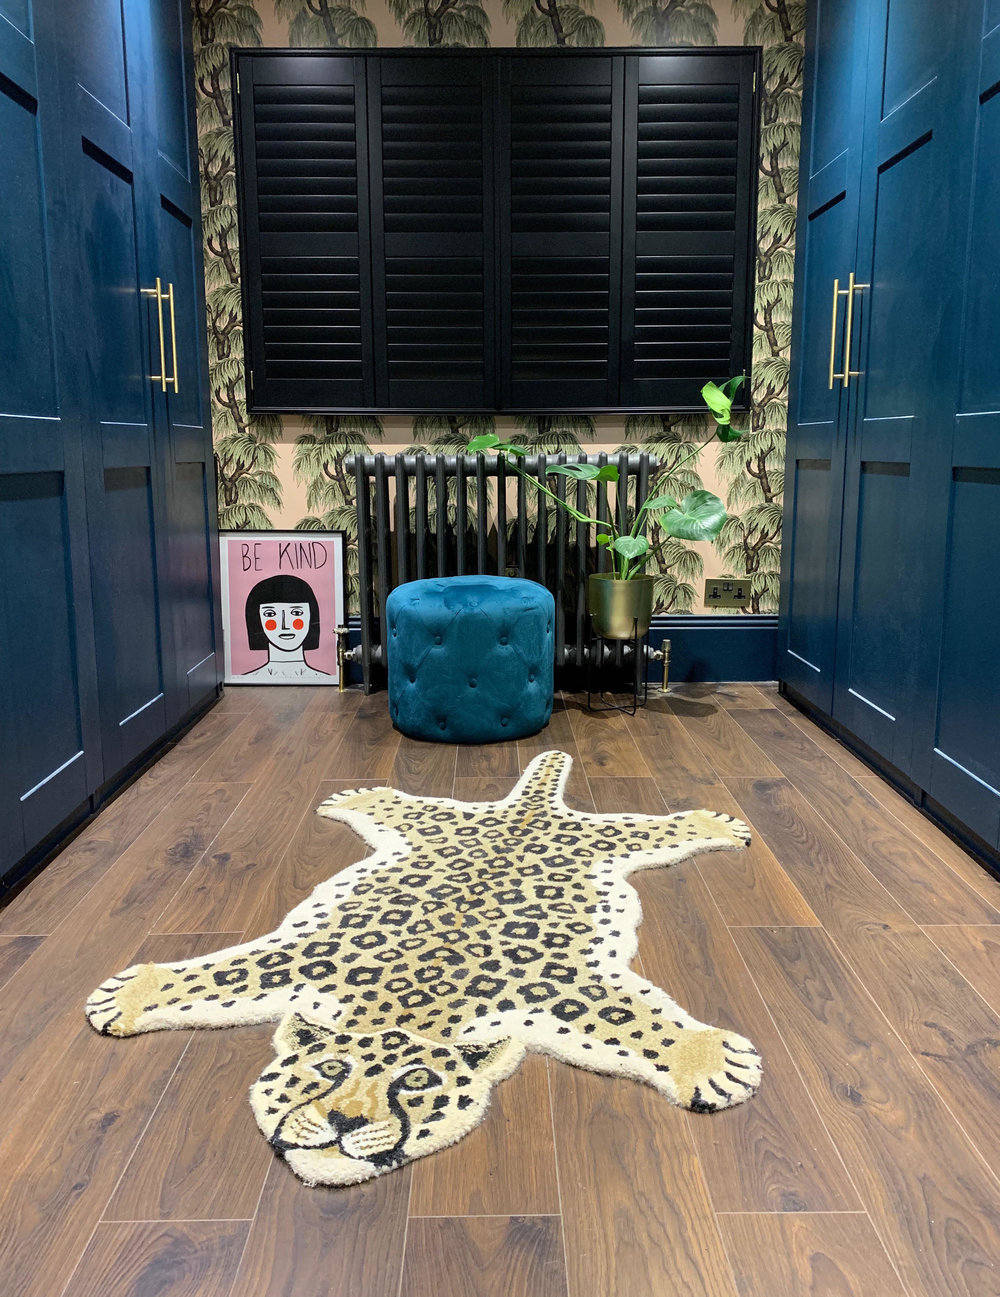 House lust House of hackney dressing room copy.jpg